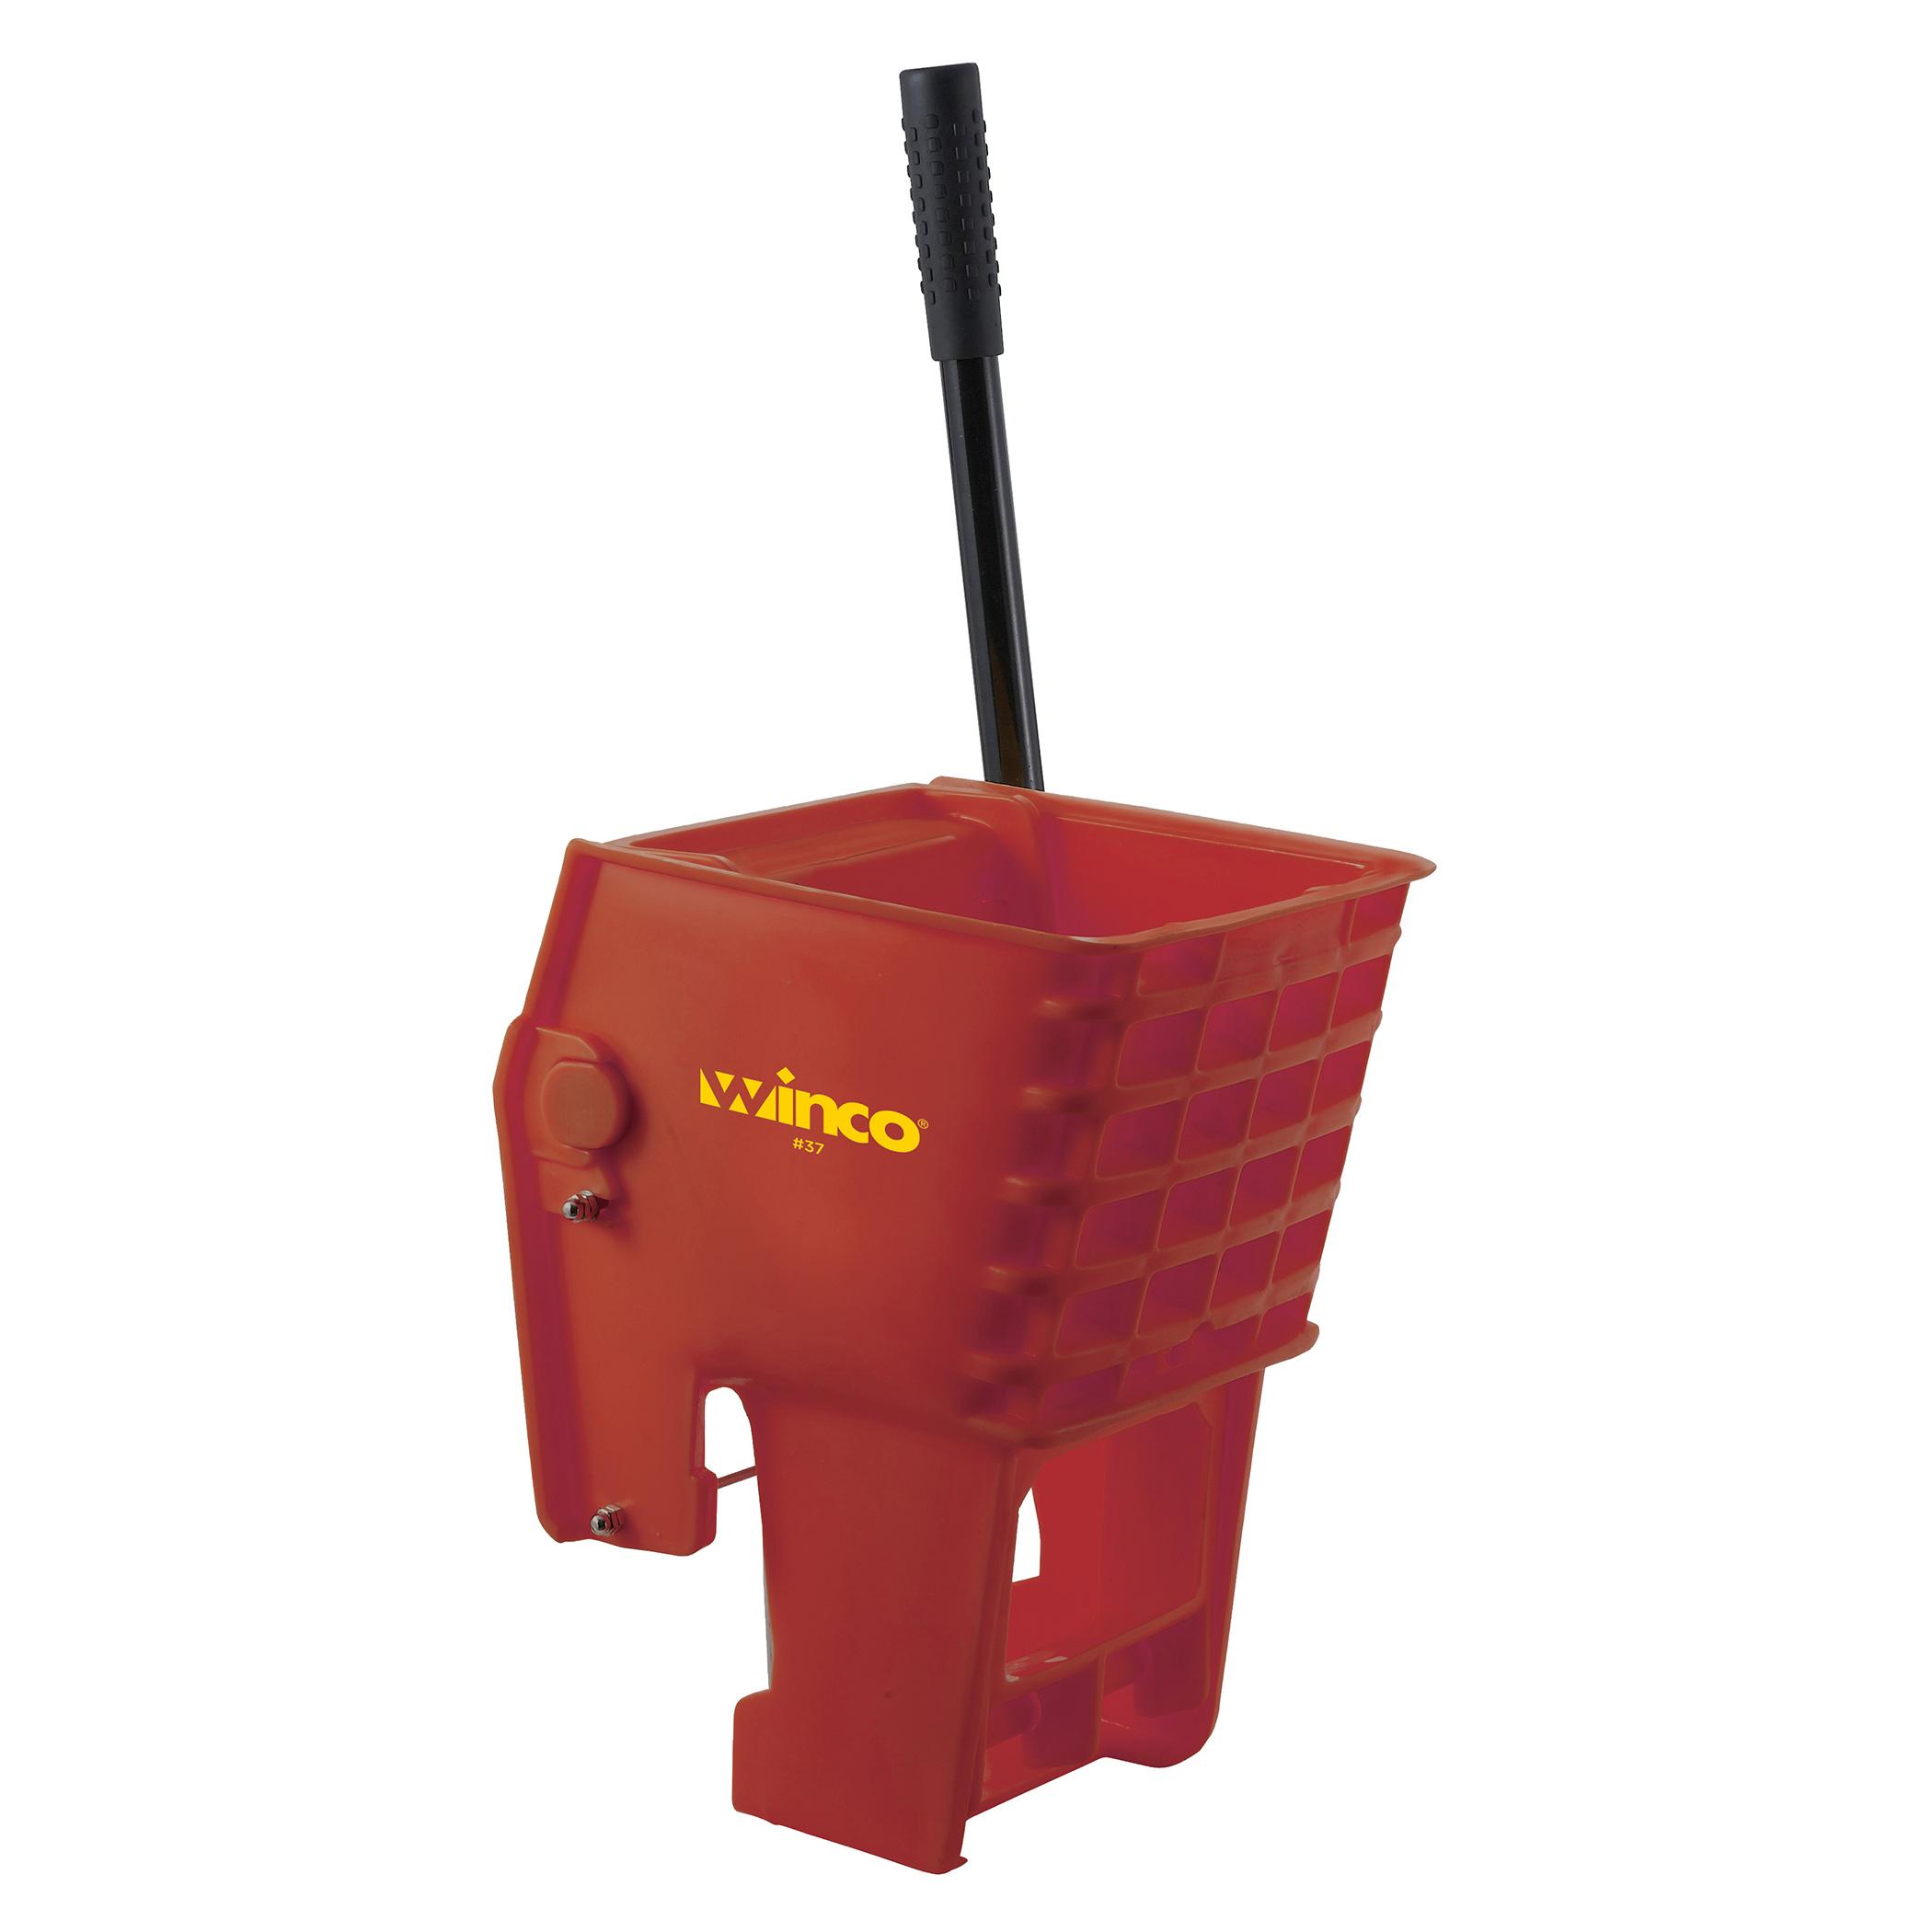 Winco MPB-36WR mop wringer